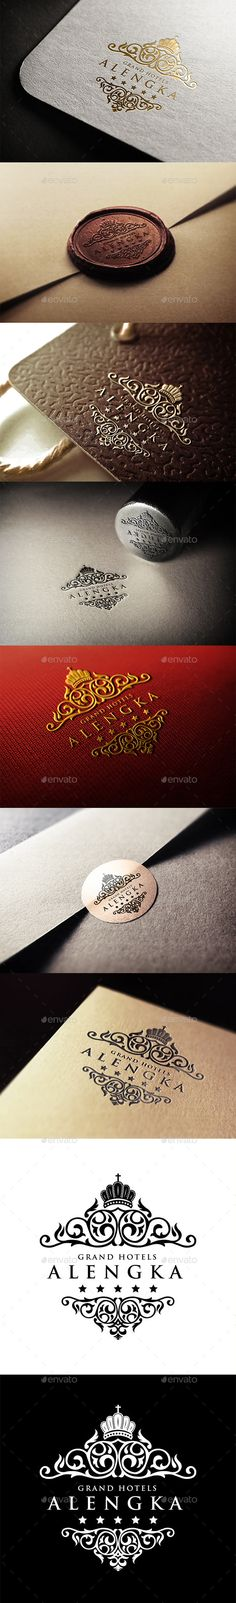 Alengka Hotels Logo Template #design #logotype Download: http://graphicriver.net/item/alengka-hotels-logo/11262560?ref=ksioks